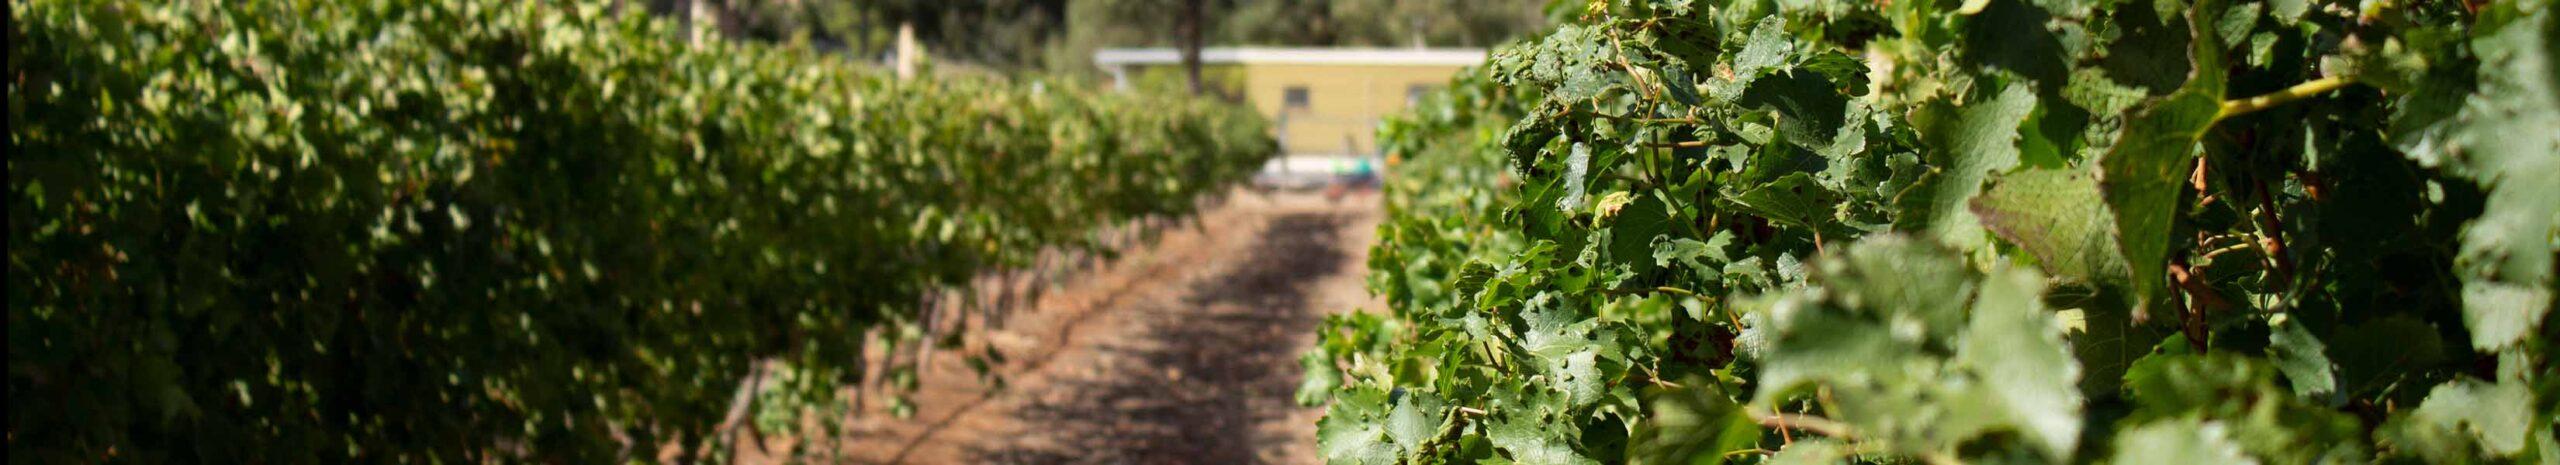 Vineyard Band 3